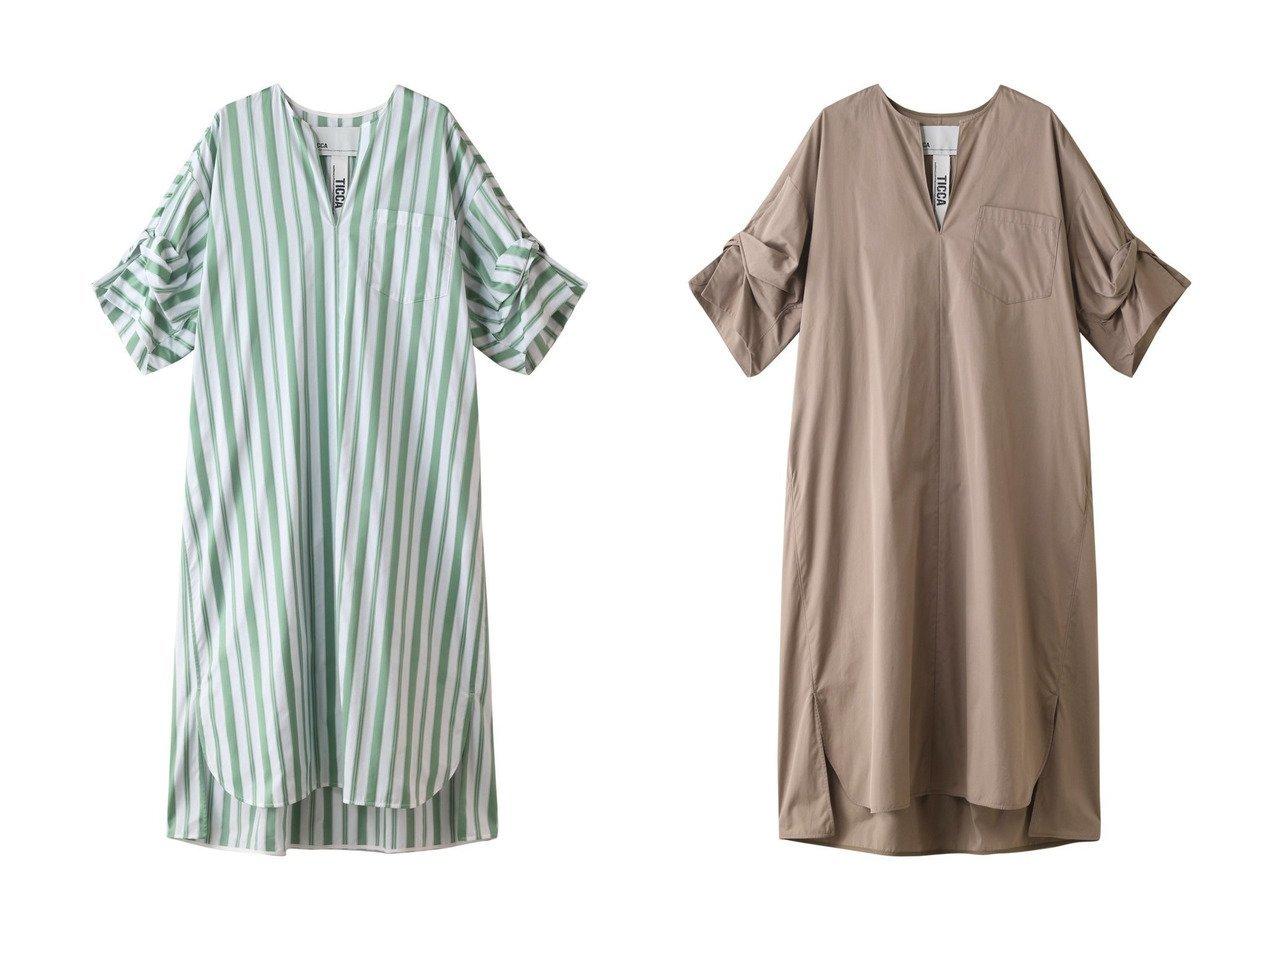 【TICCA/ティッカ】のツイストスリーブストライプワンピース&ツイストスリーブワンピース ワンピース・ドレスのおすすめ!人気、トレンド・レディースファッションの通販 おすすめで人気の流行・トレンド、ファッションの通販商品 メンズファッション・キッズファッション・インテリア・家具・レディースファッション・服の通販 founy(ファニー) https://founy.com/ ファッション Fashion レディースファッション WOMEN ワンピース Dress 2021年 2021 2021 春夏 S/S SS Spring/Summer 2021 S/S 春夏 SS Spring/Summer ストライプ スリット スリーブ ツイスト リラックス ロング 春 Spring |ID:crp329100000015044